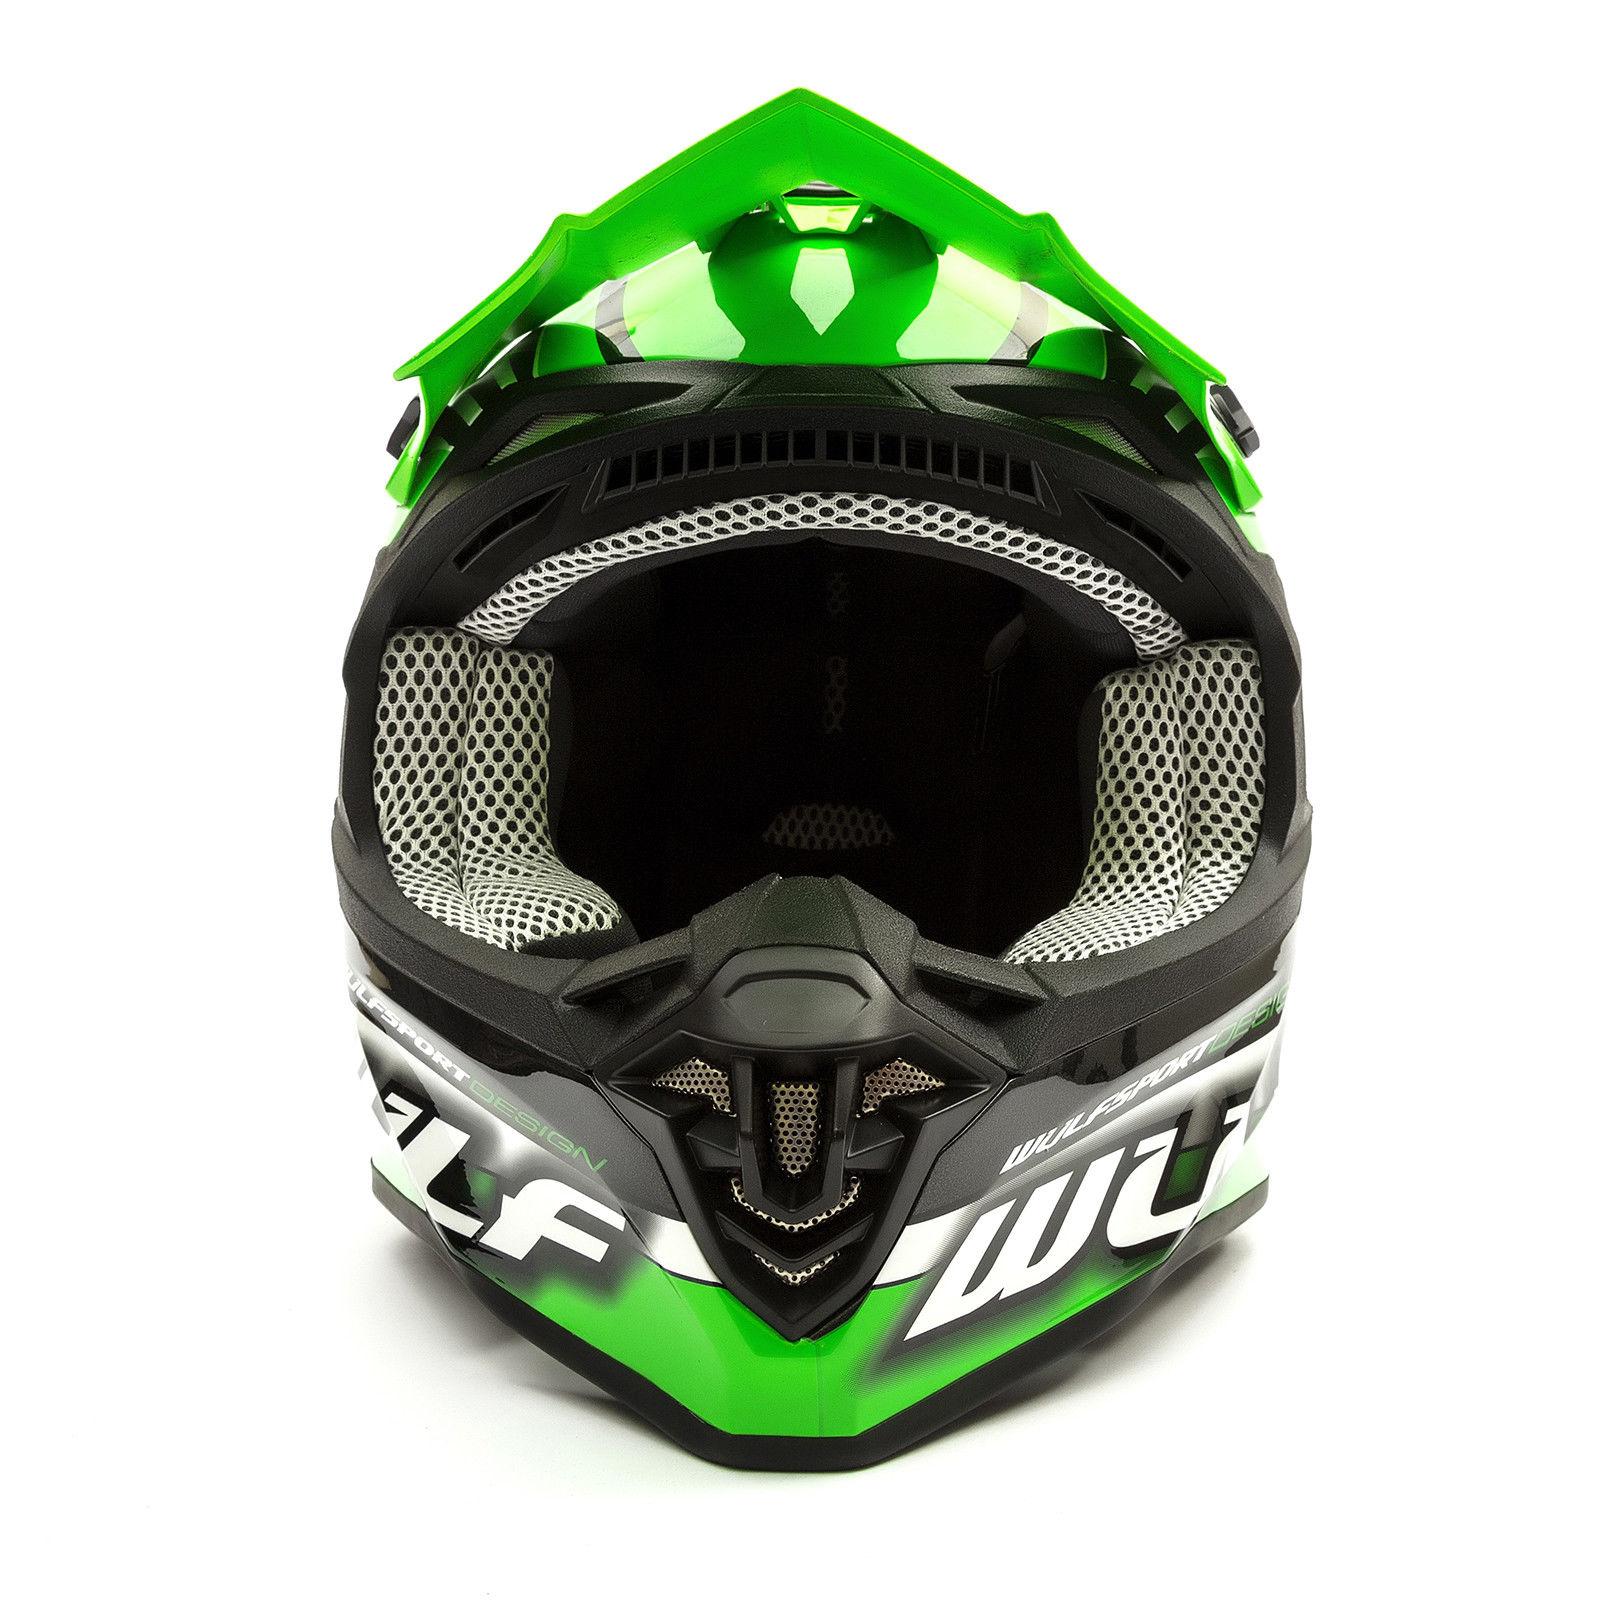 Wulfsport-Adult-Sceptre-Helmets-Motocross-Pitbike-Motorbike-Off-Road-Racing-ATV thumbnail 74